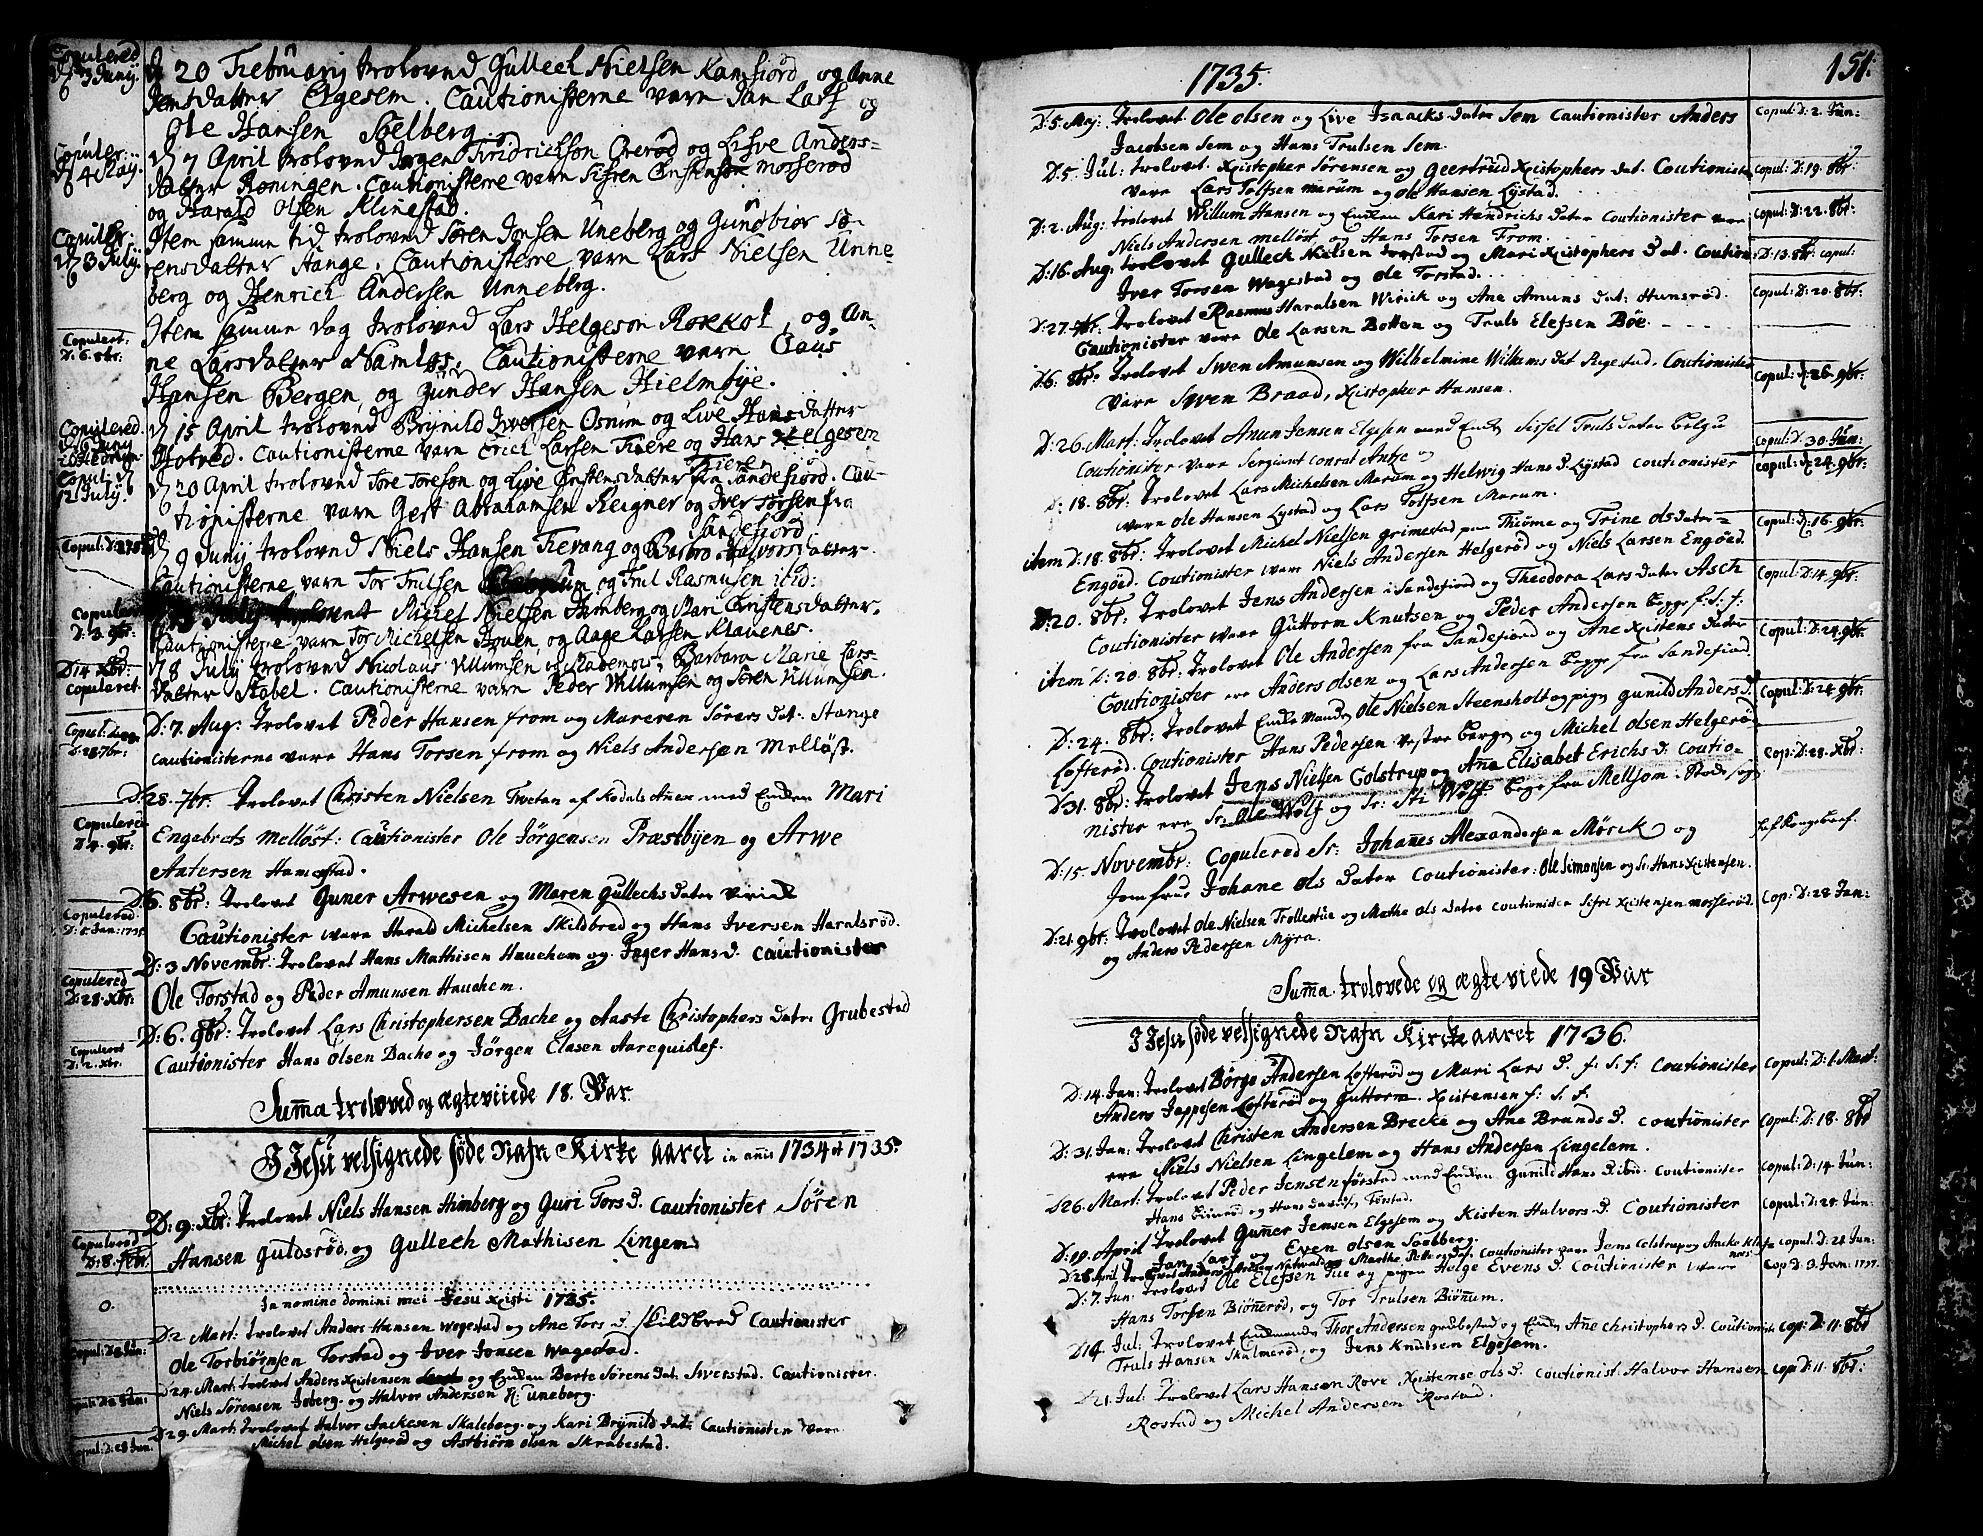 SAKO, Sandar kirkebøker, F/Fa/L0002: Parish register (official) no. 2, 1733-1788, p. 151